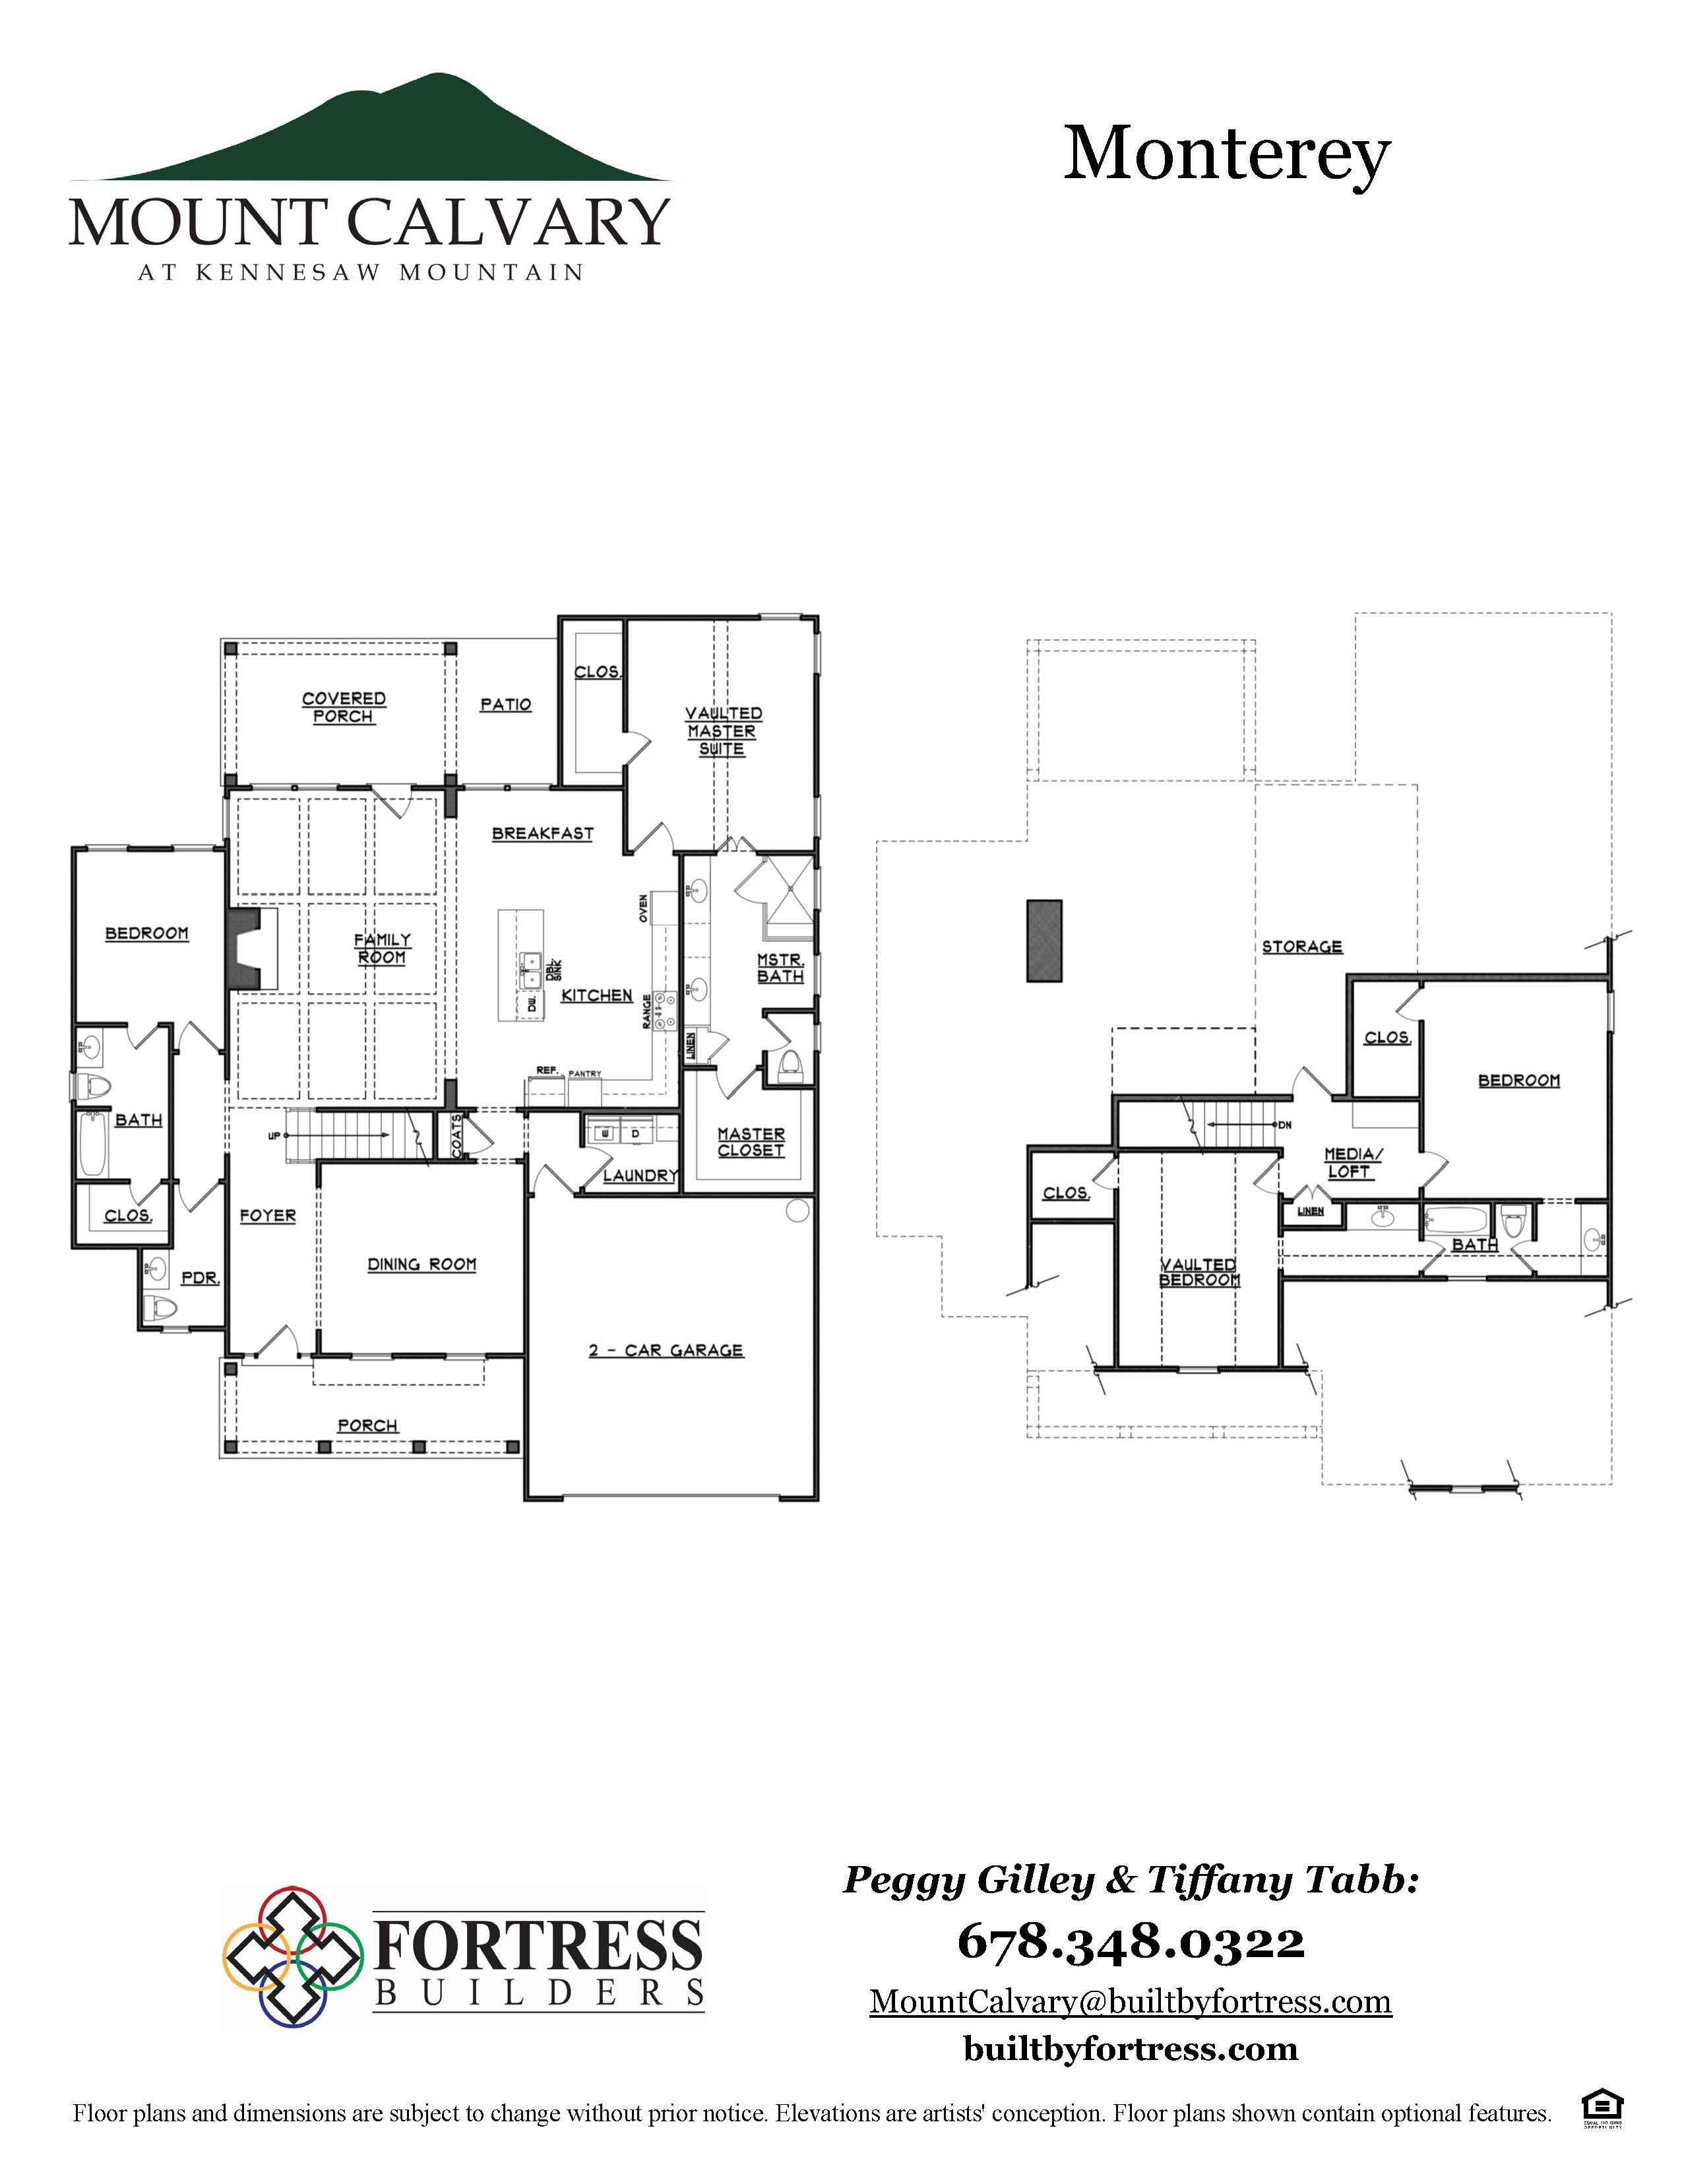 Mount Calvary Floor Plans_Page_2.jpg